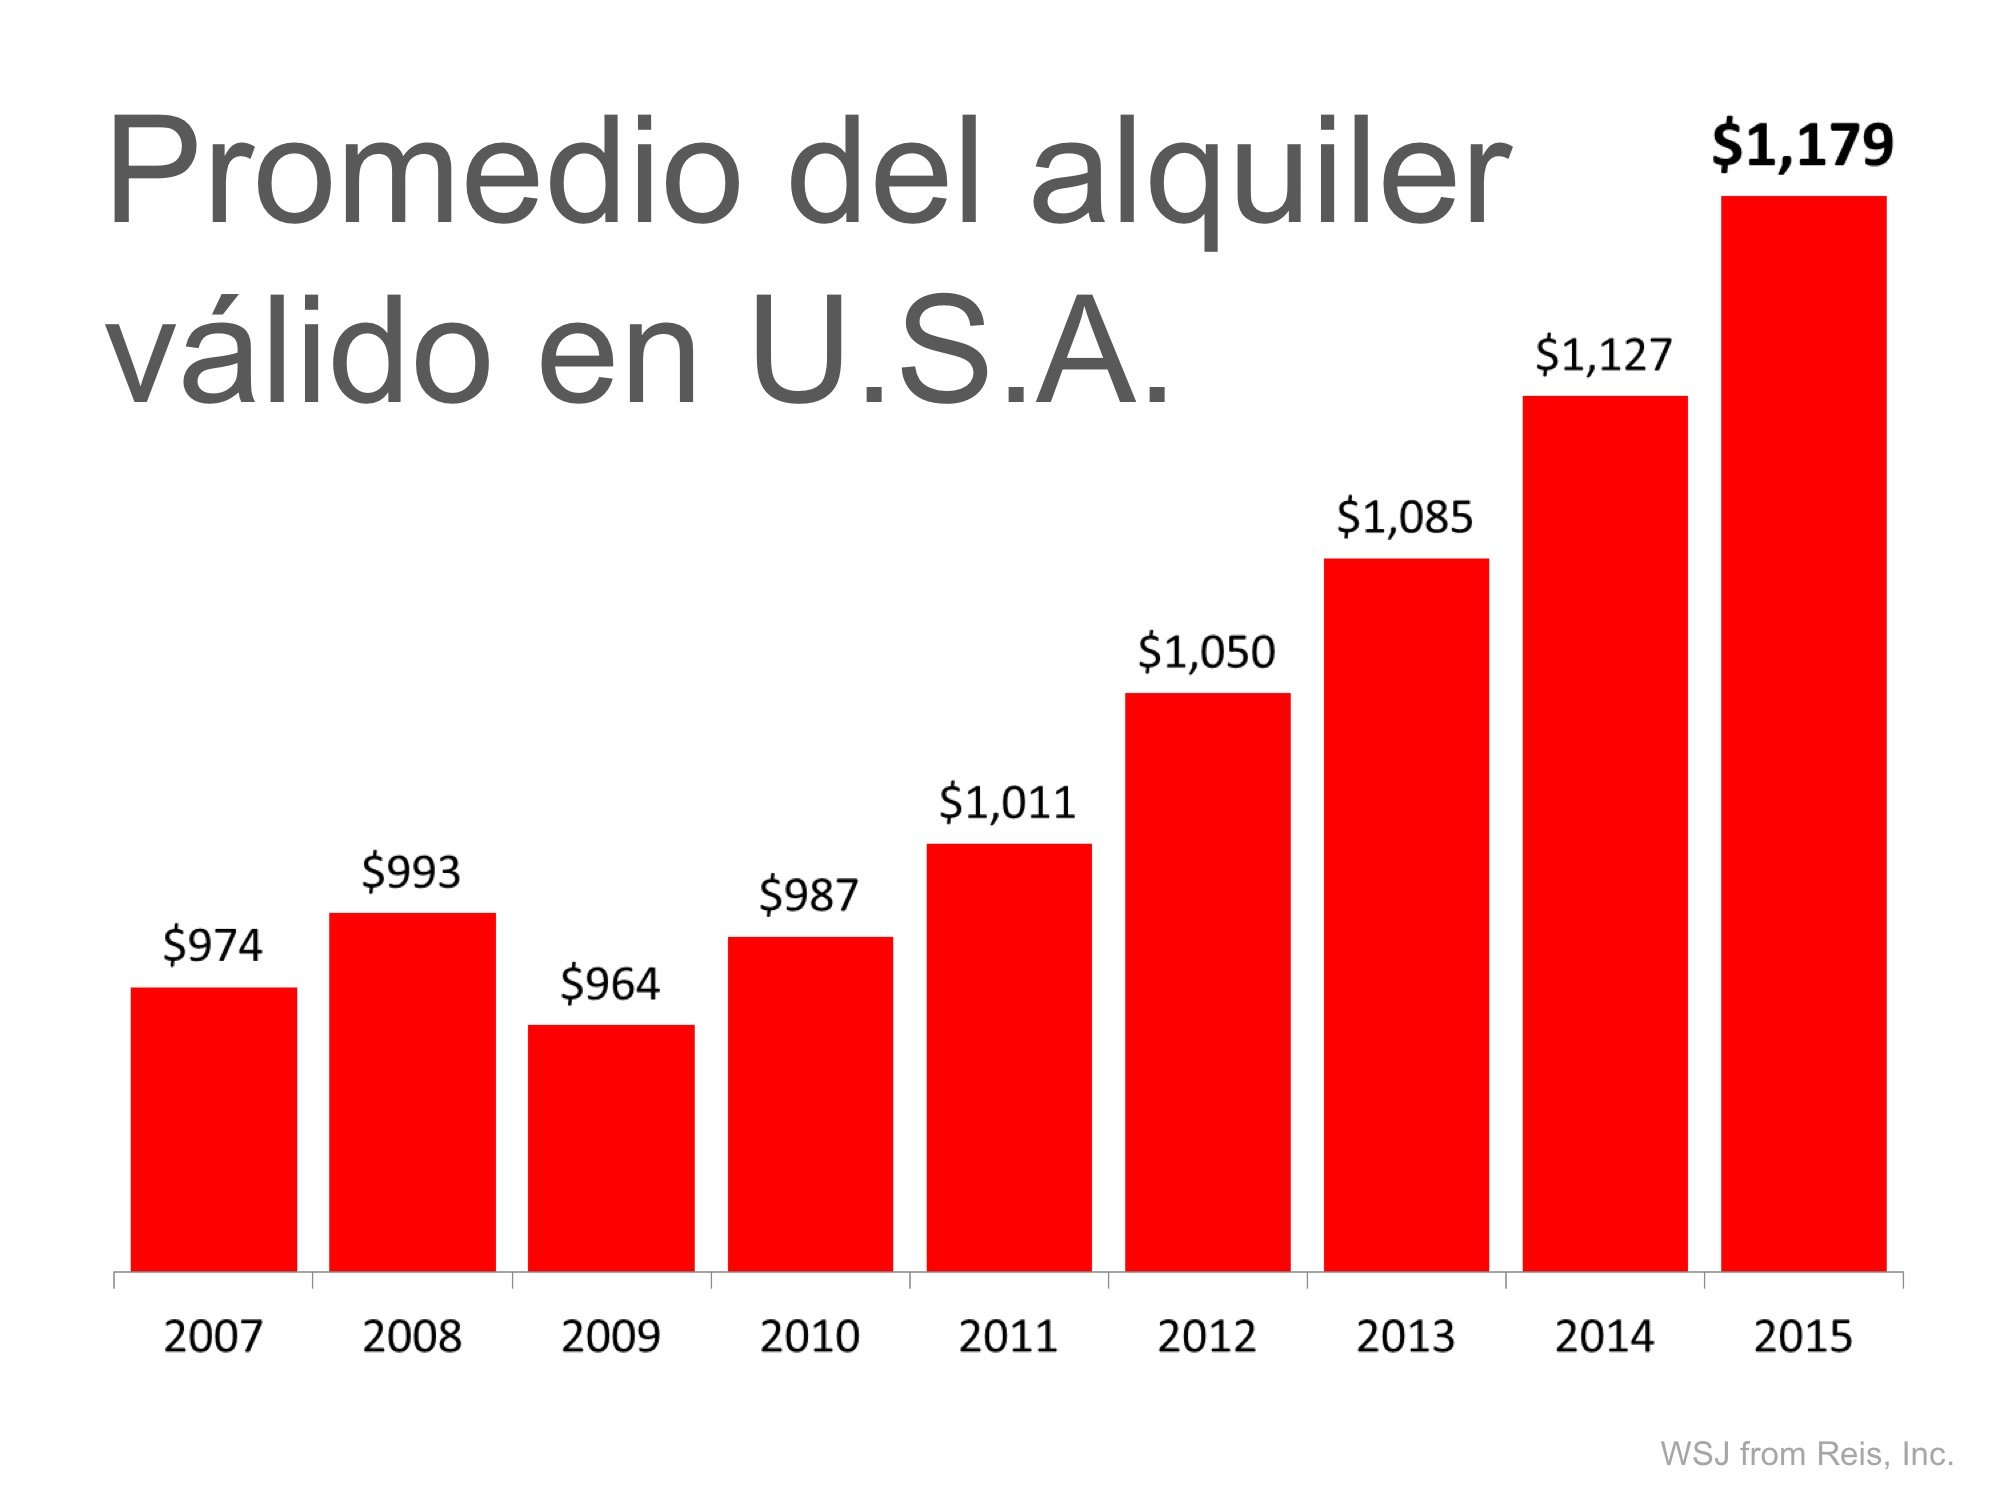 Promedio del alquiler valido en USA   Keeping Current Matters